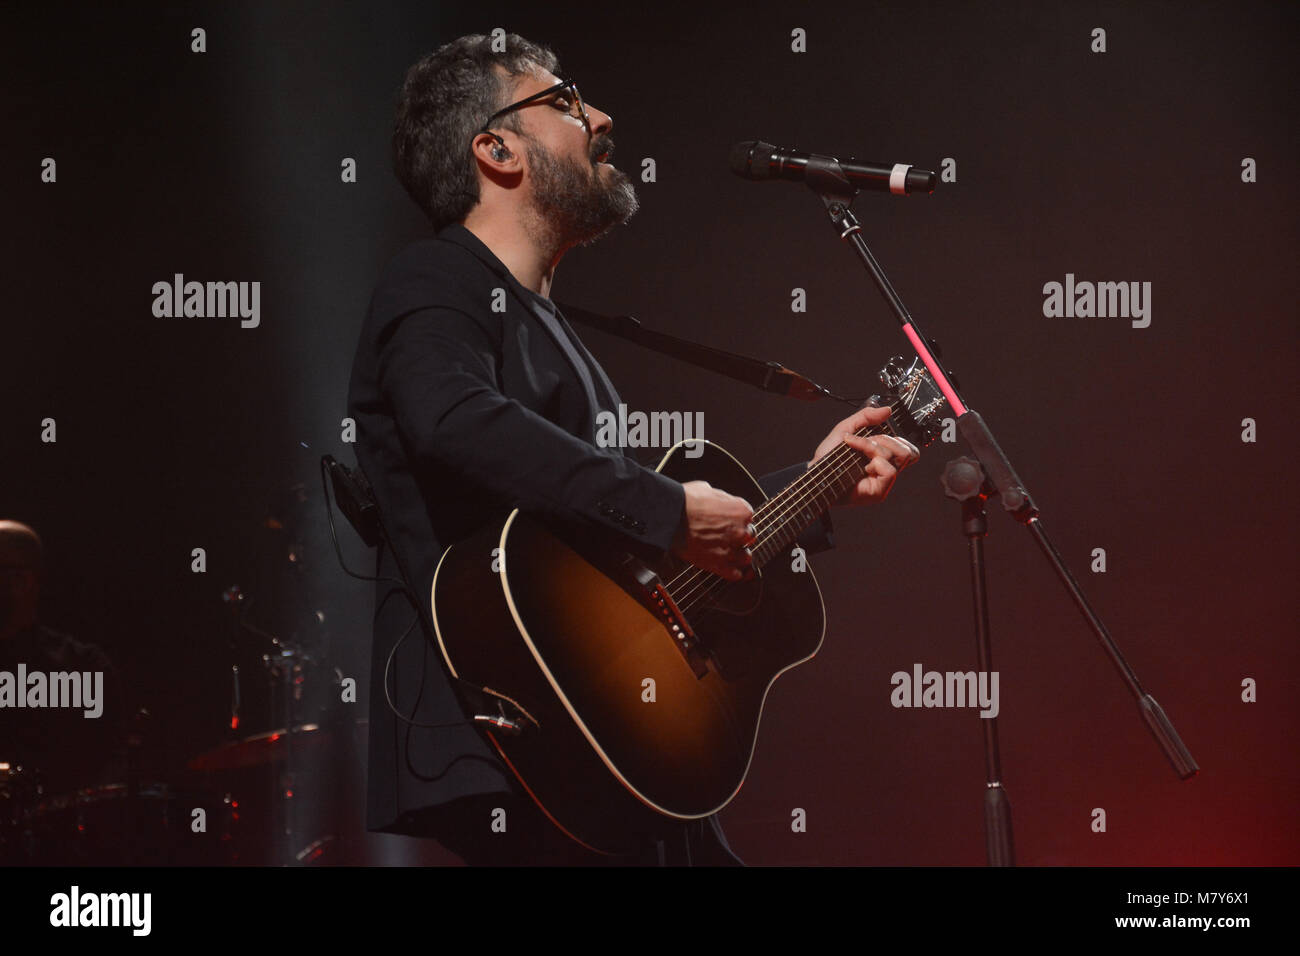 Naples, Italy. 26th Feb, 2018. The Italian singer and song-writer Dario Brunori also known as Brunori sas performs - Stock Image